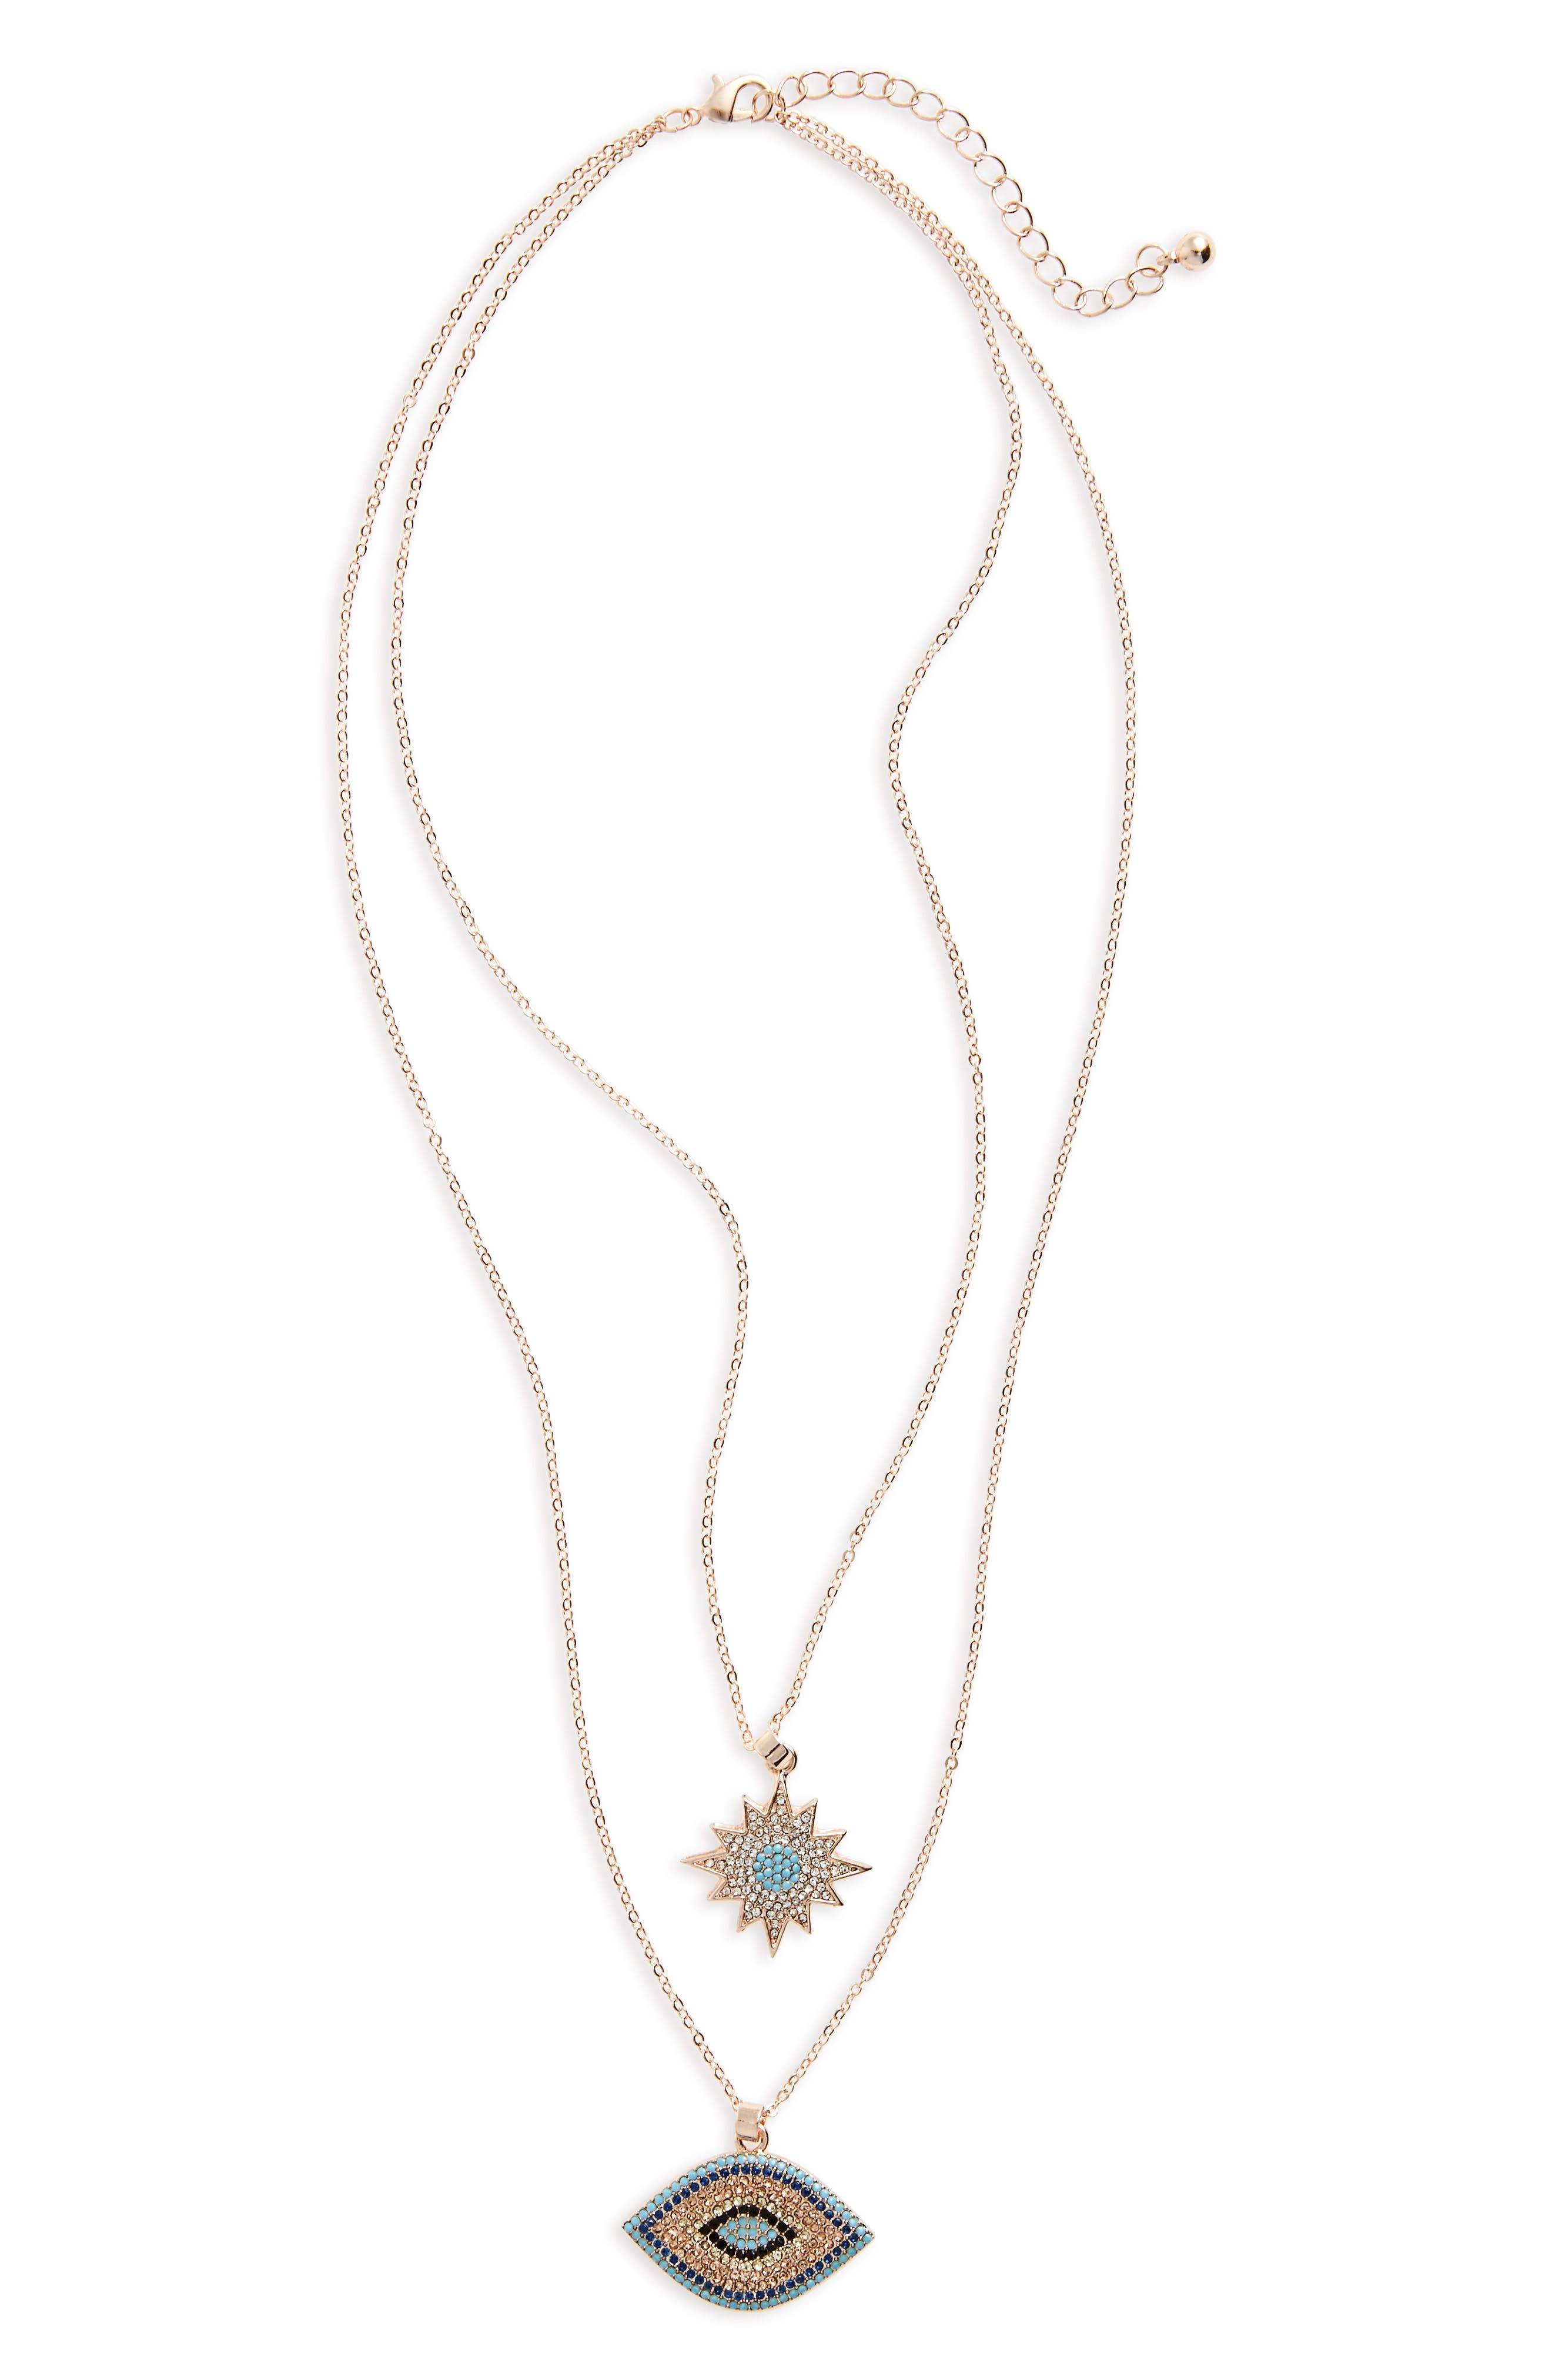 Multistrand Pendant Necklace,                             Main thumbnail 1, color,                             710